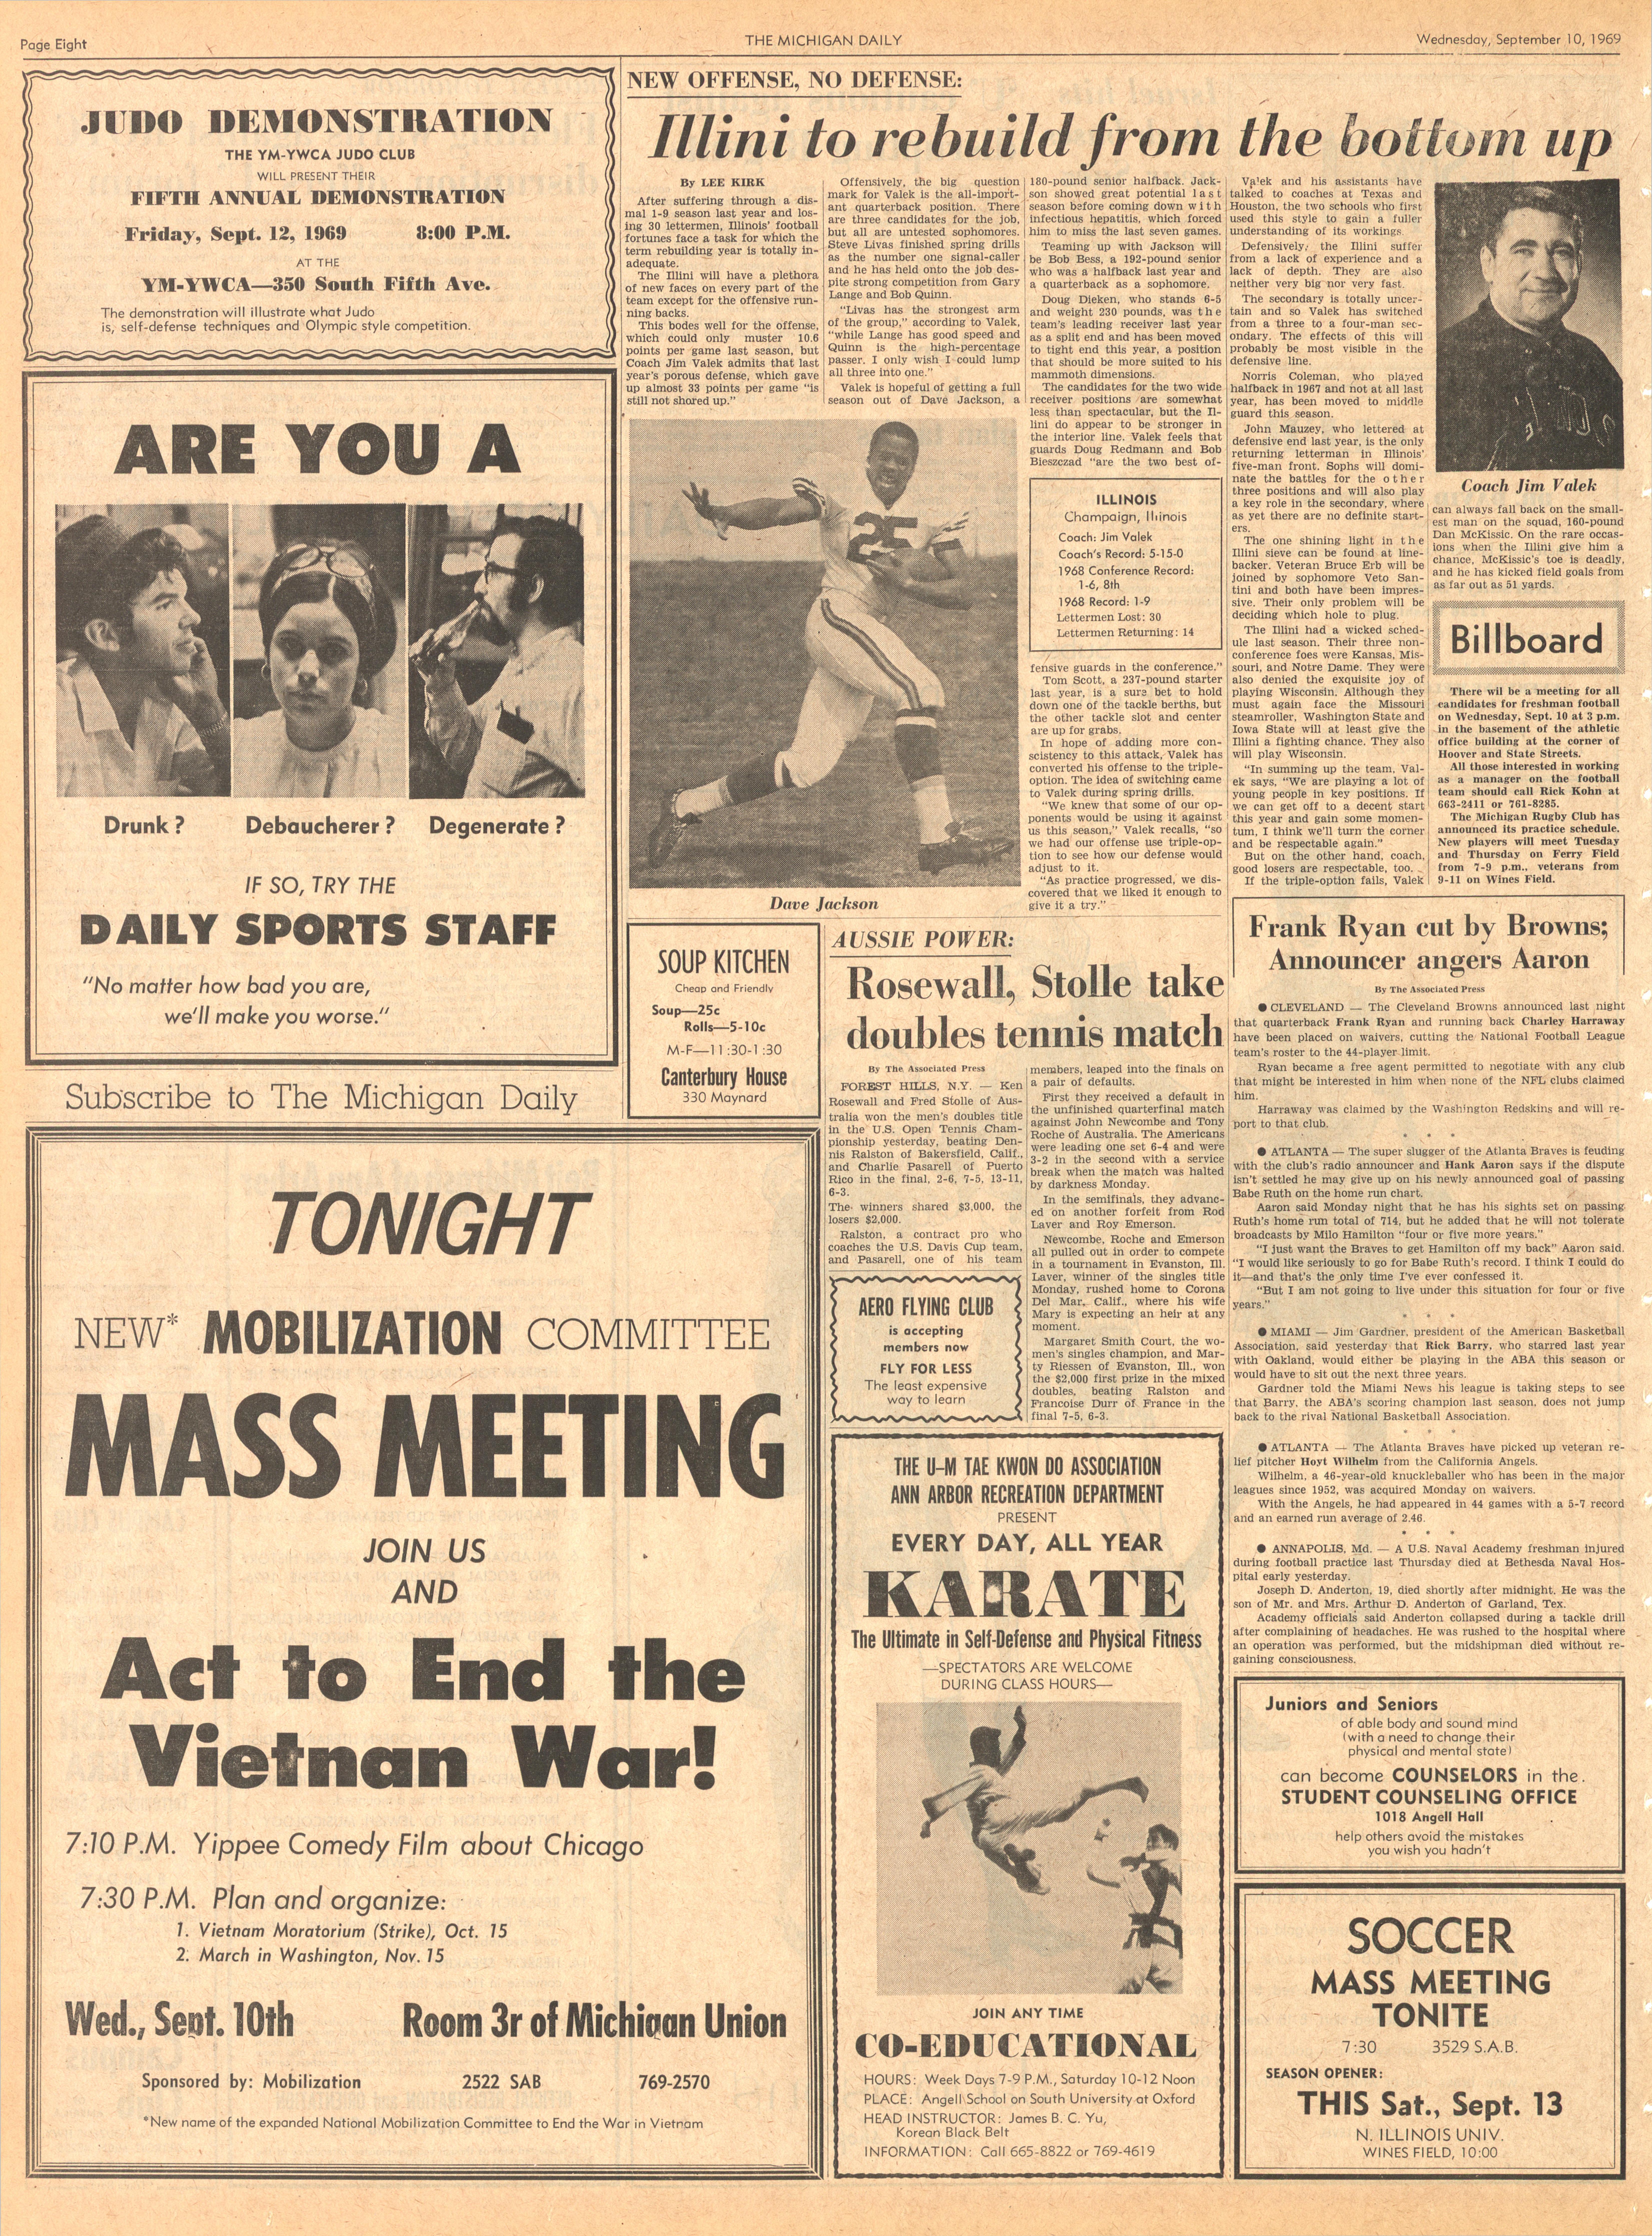 Michigan Daily Digital Archives - September 10, 1969 (vol